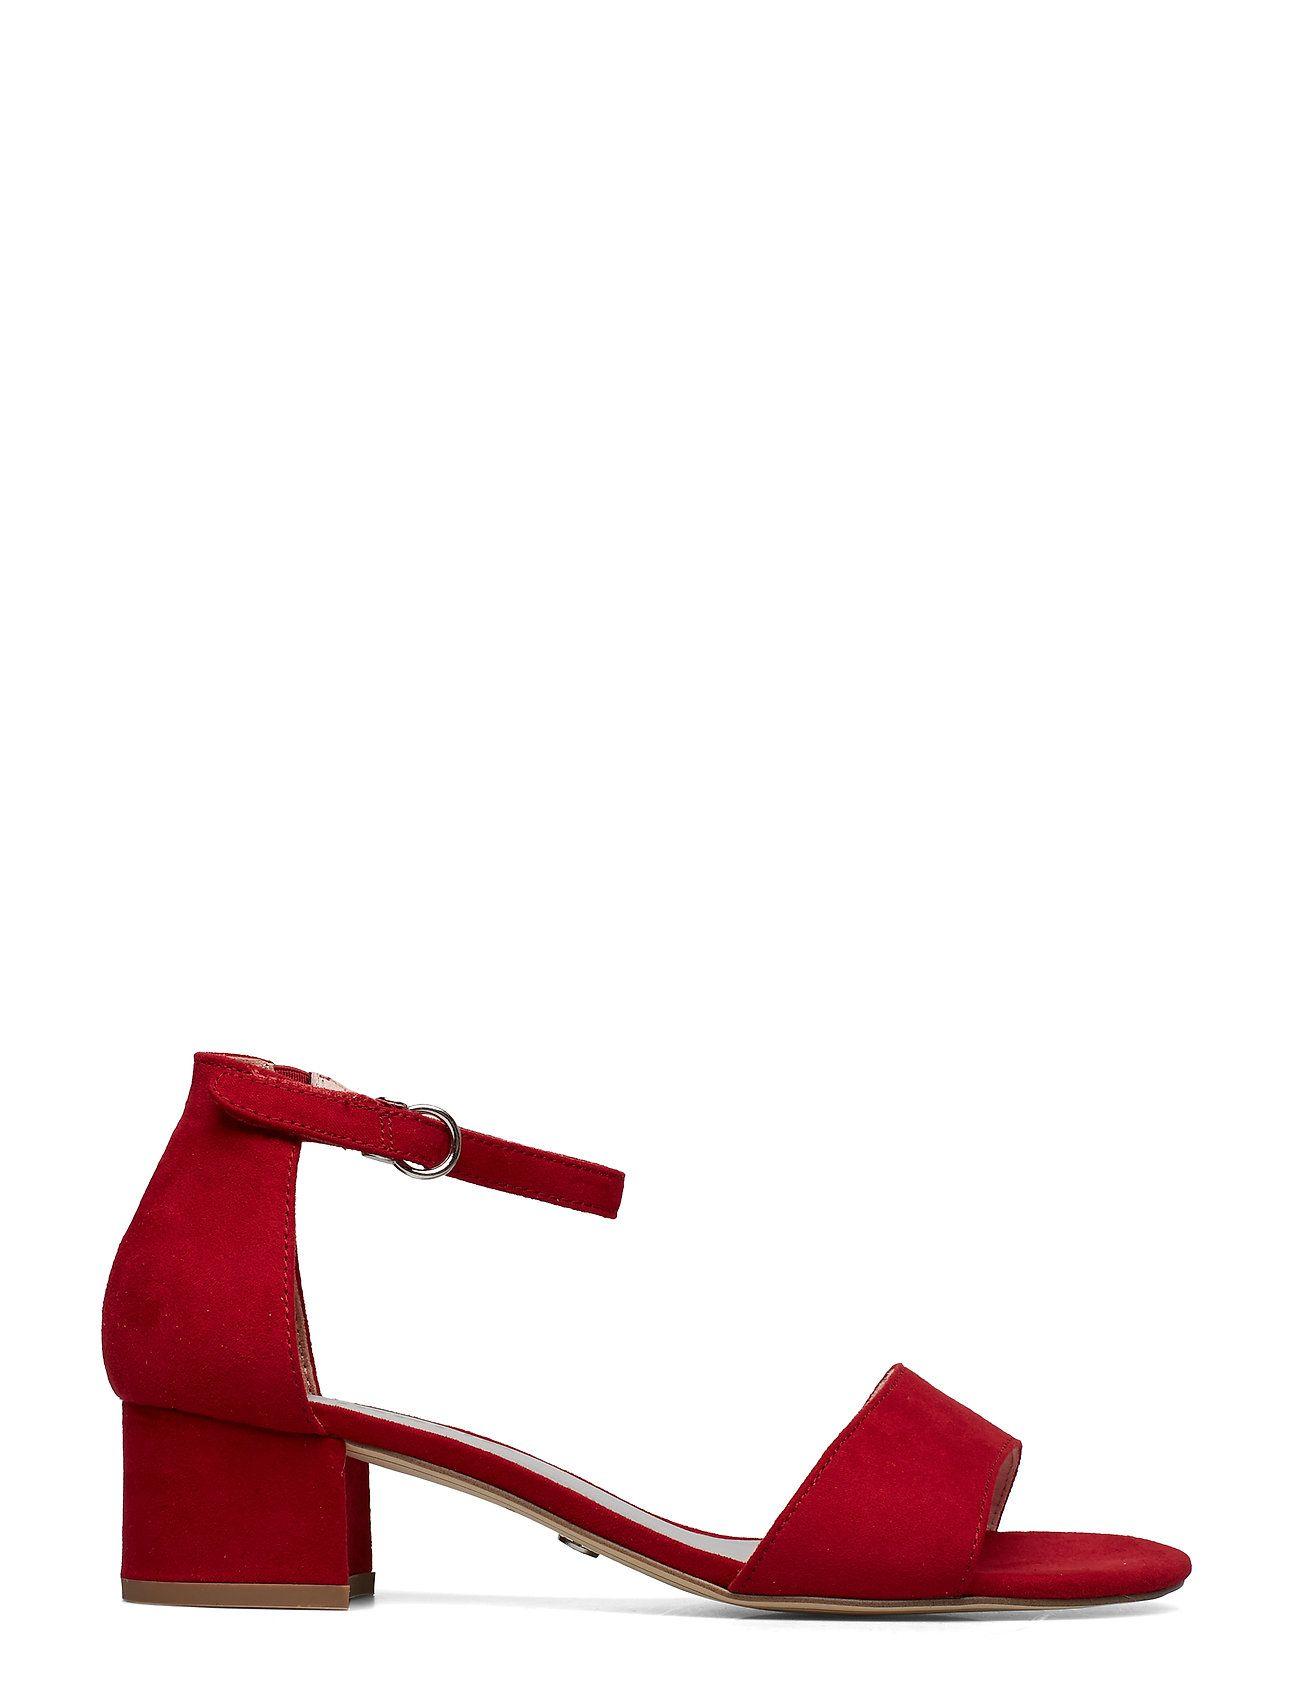 Woms Sandals (Black) (499 kr) Tamaris |